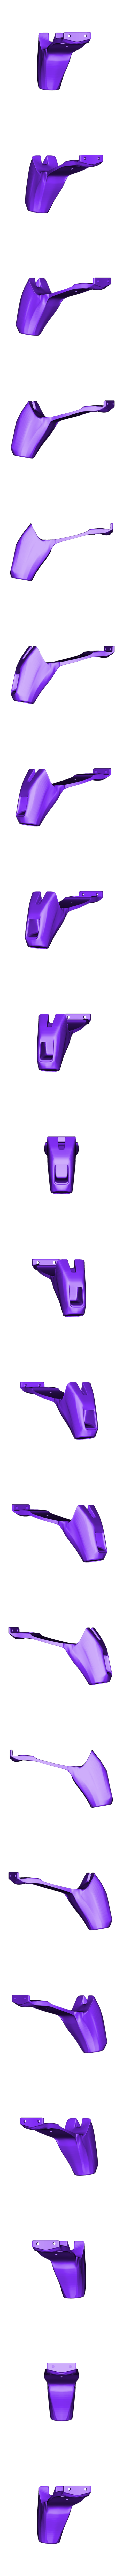 Lucio_inner.stl Download free STL file Overwatch Lucio Blaster • 3D printer object, Adafruit